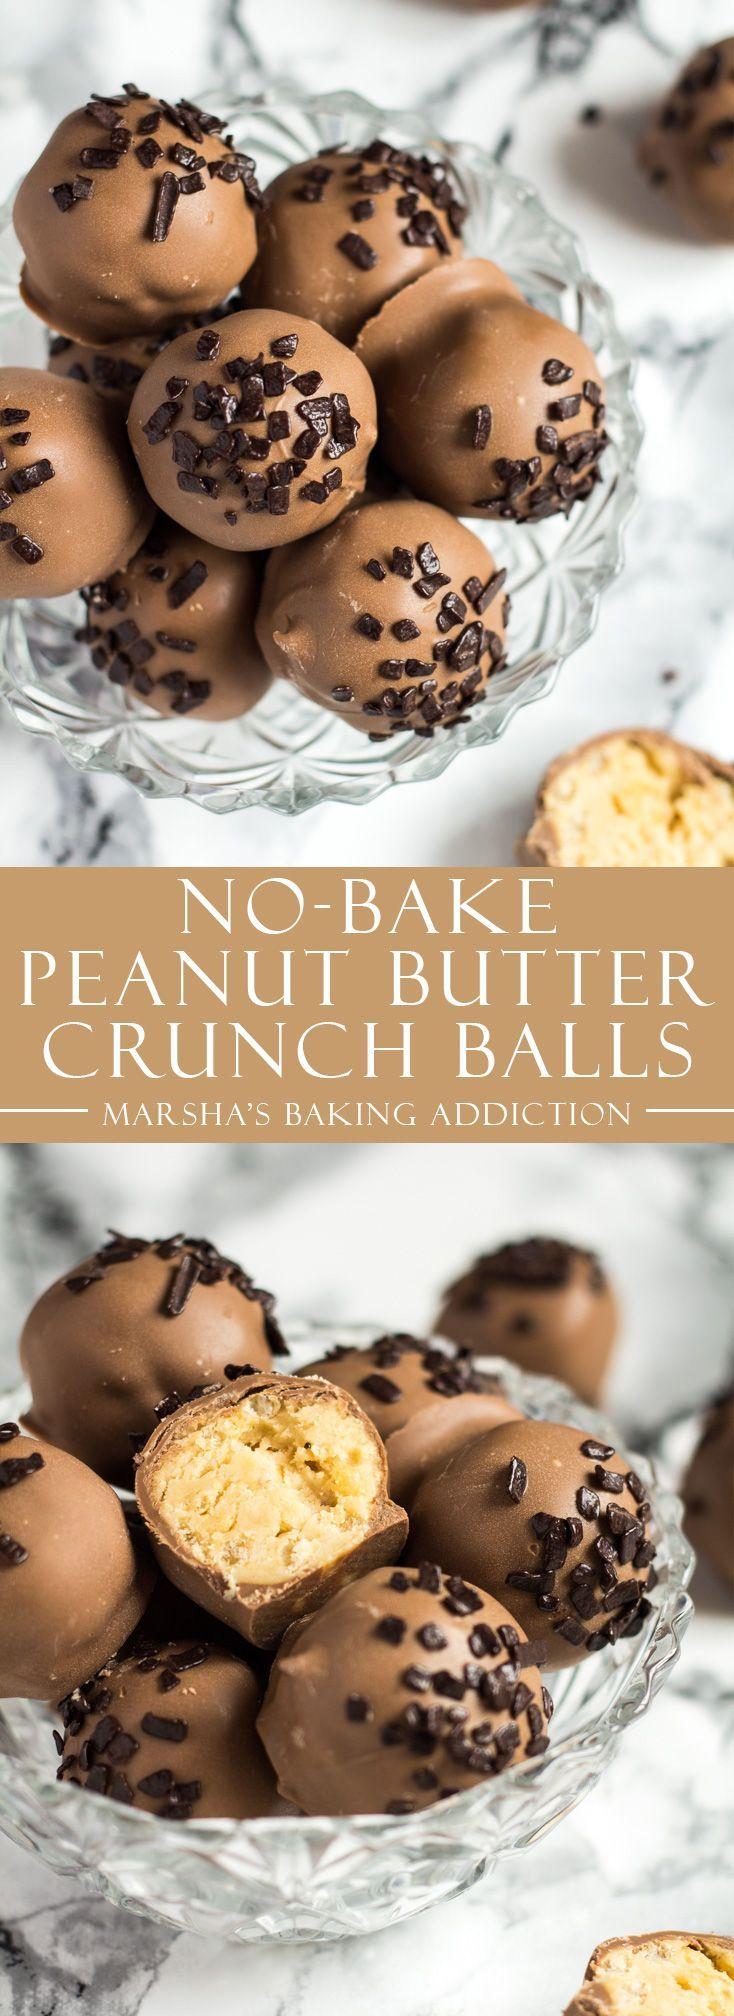 No-Bake Peanut Butter Crunch Balls | marshasbakingaddiction.com @marshasbakeblog(Baking Cheesecake Peanut Butter)